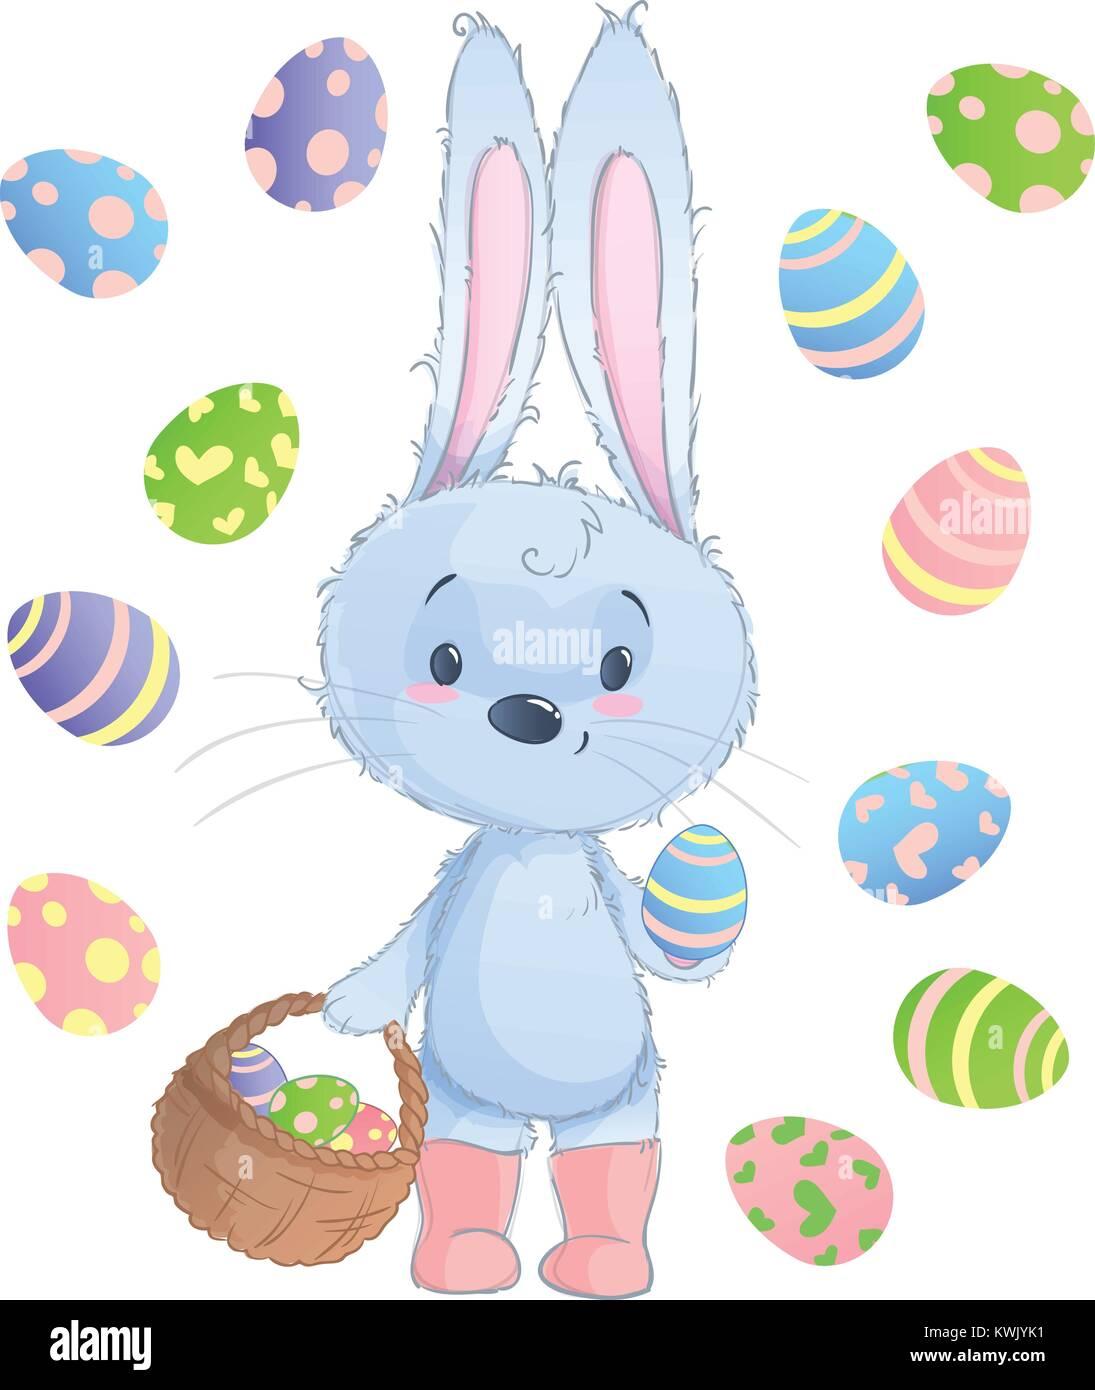 Frohe Ostern Hase Vector Illustration Clipart Für Ostern Grußkarte